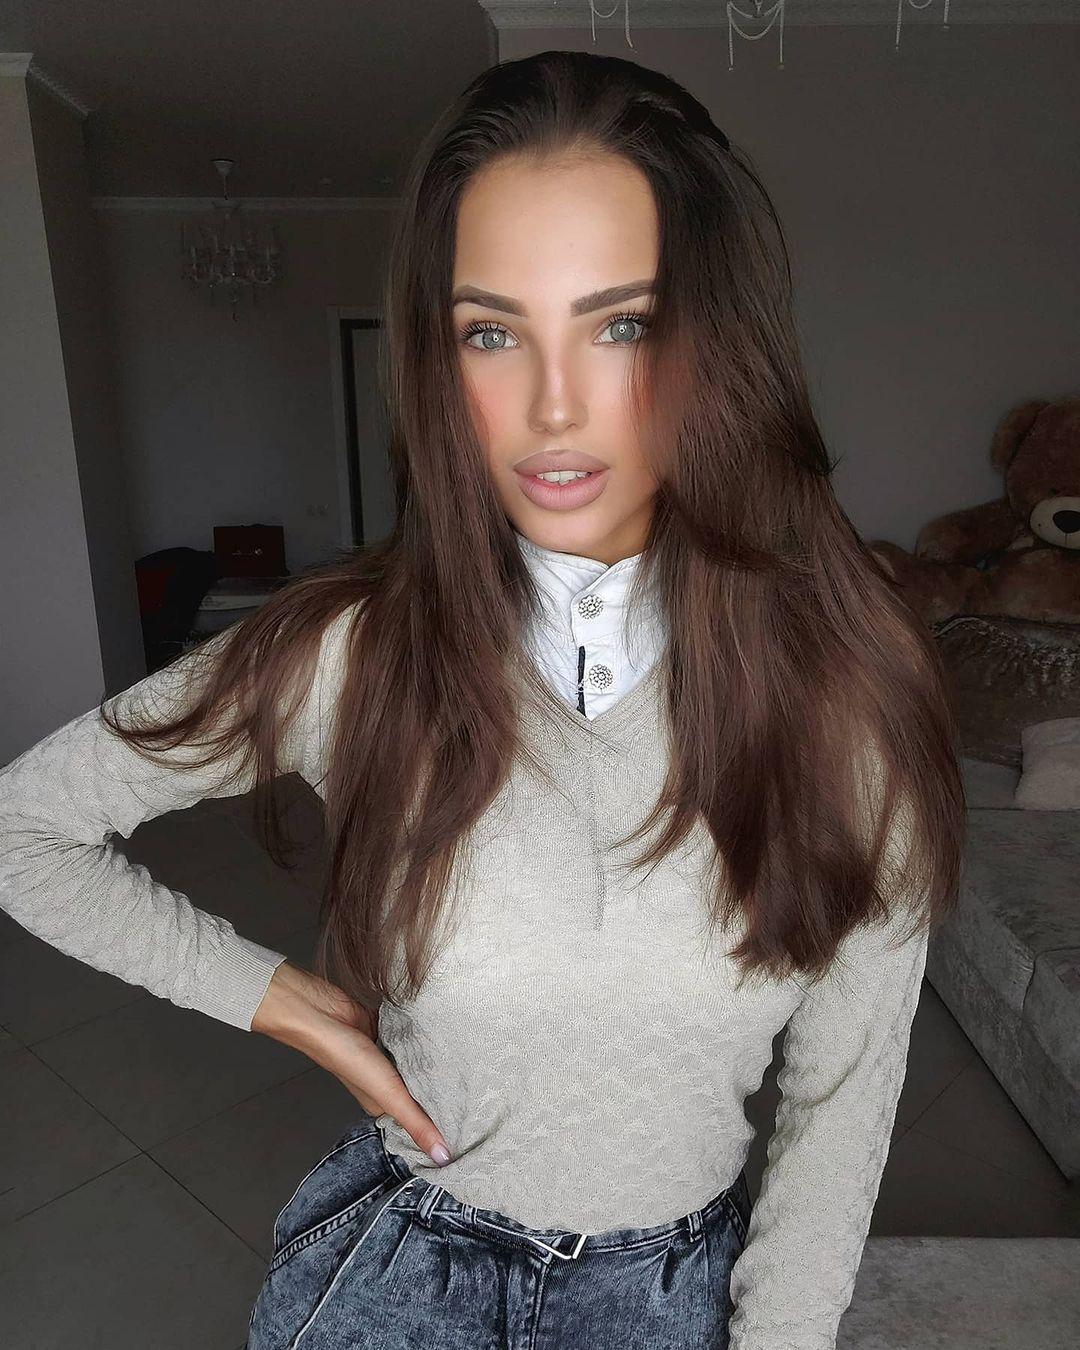 Elizaveta-Berejnaya-Wallpapers-Insta-Fit-Bio-Miss-elizabeth-sol-Wallpapers-Insta-Fit-Bio-20